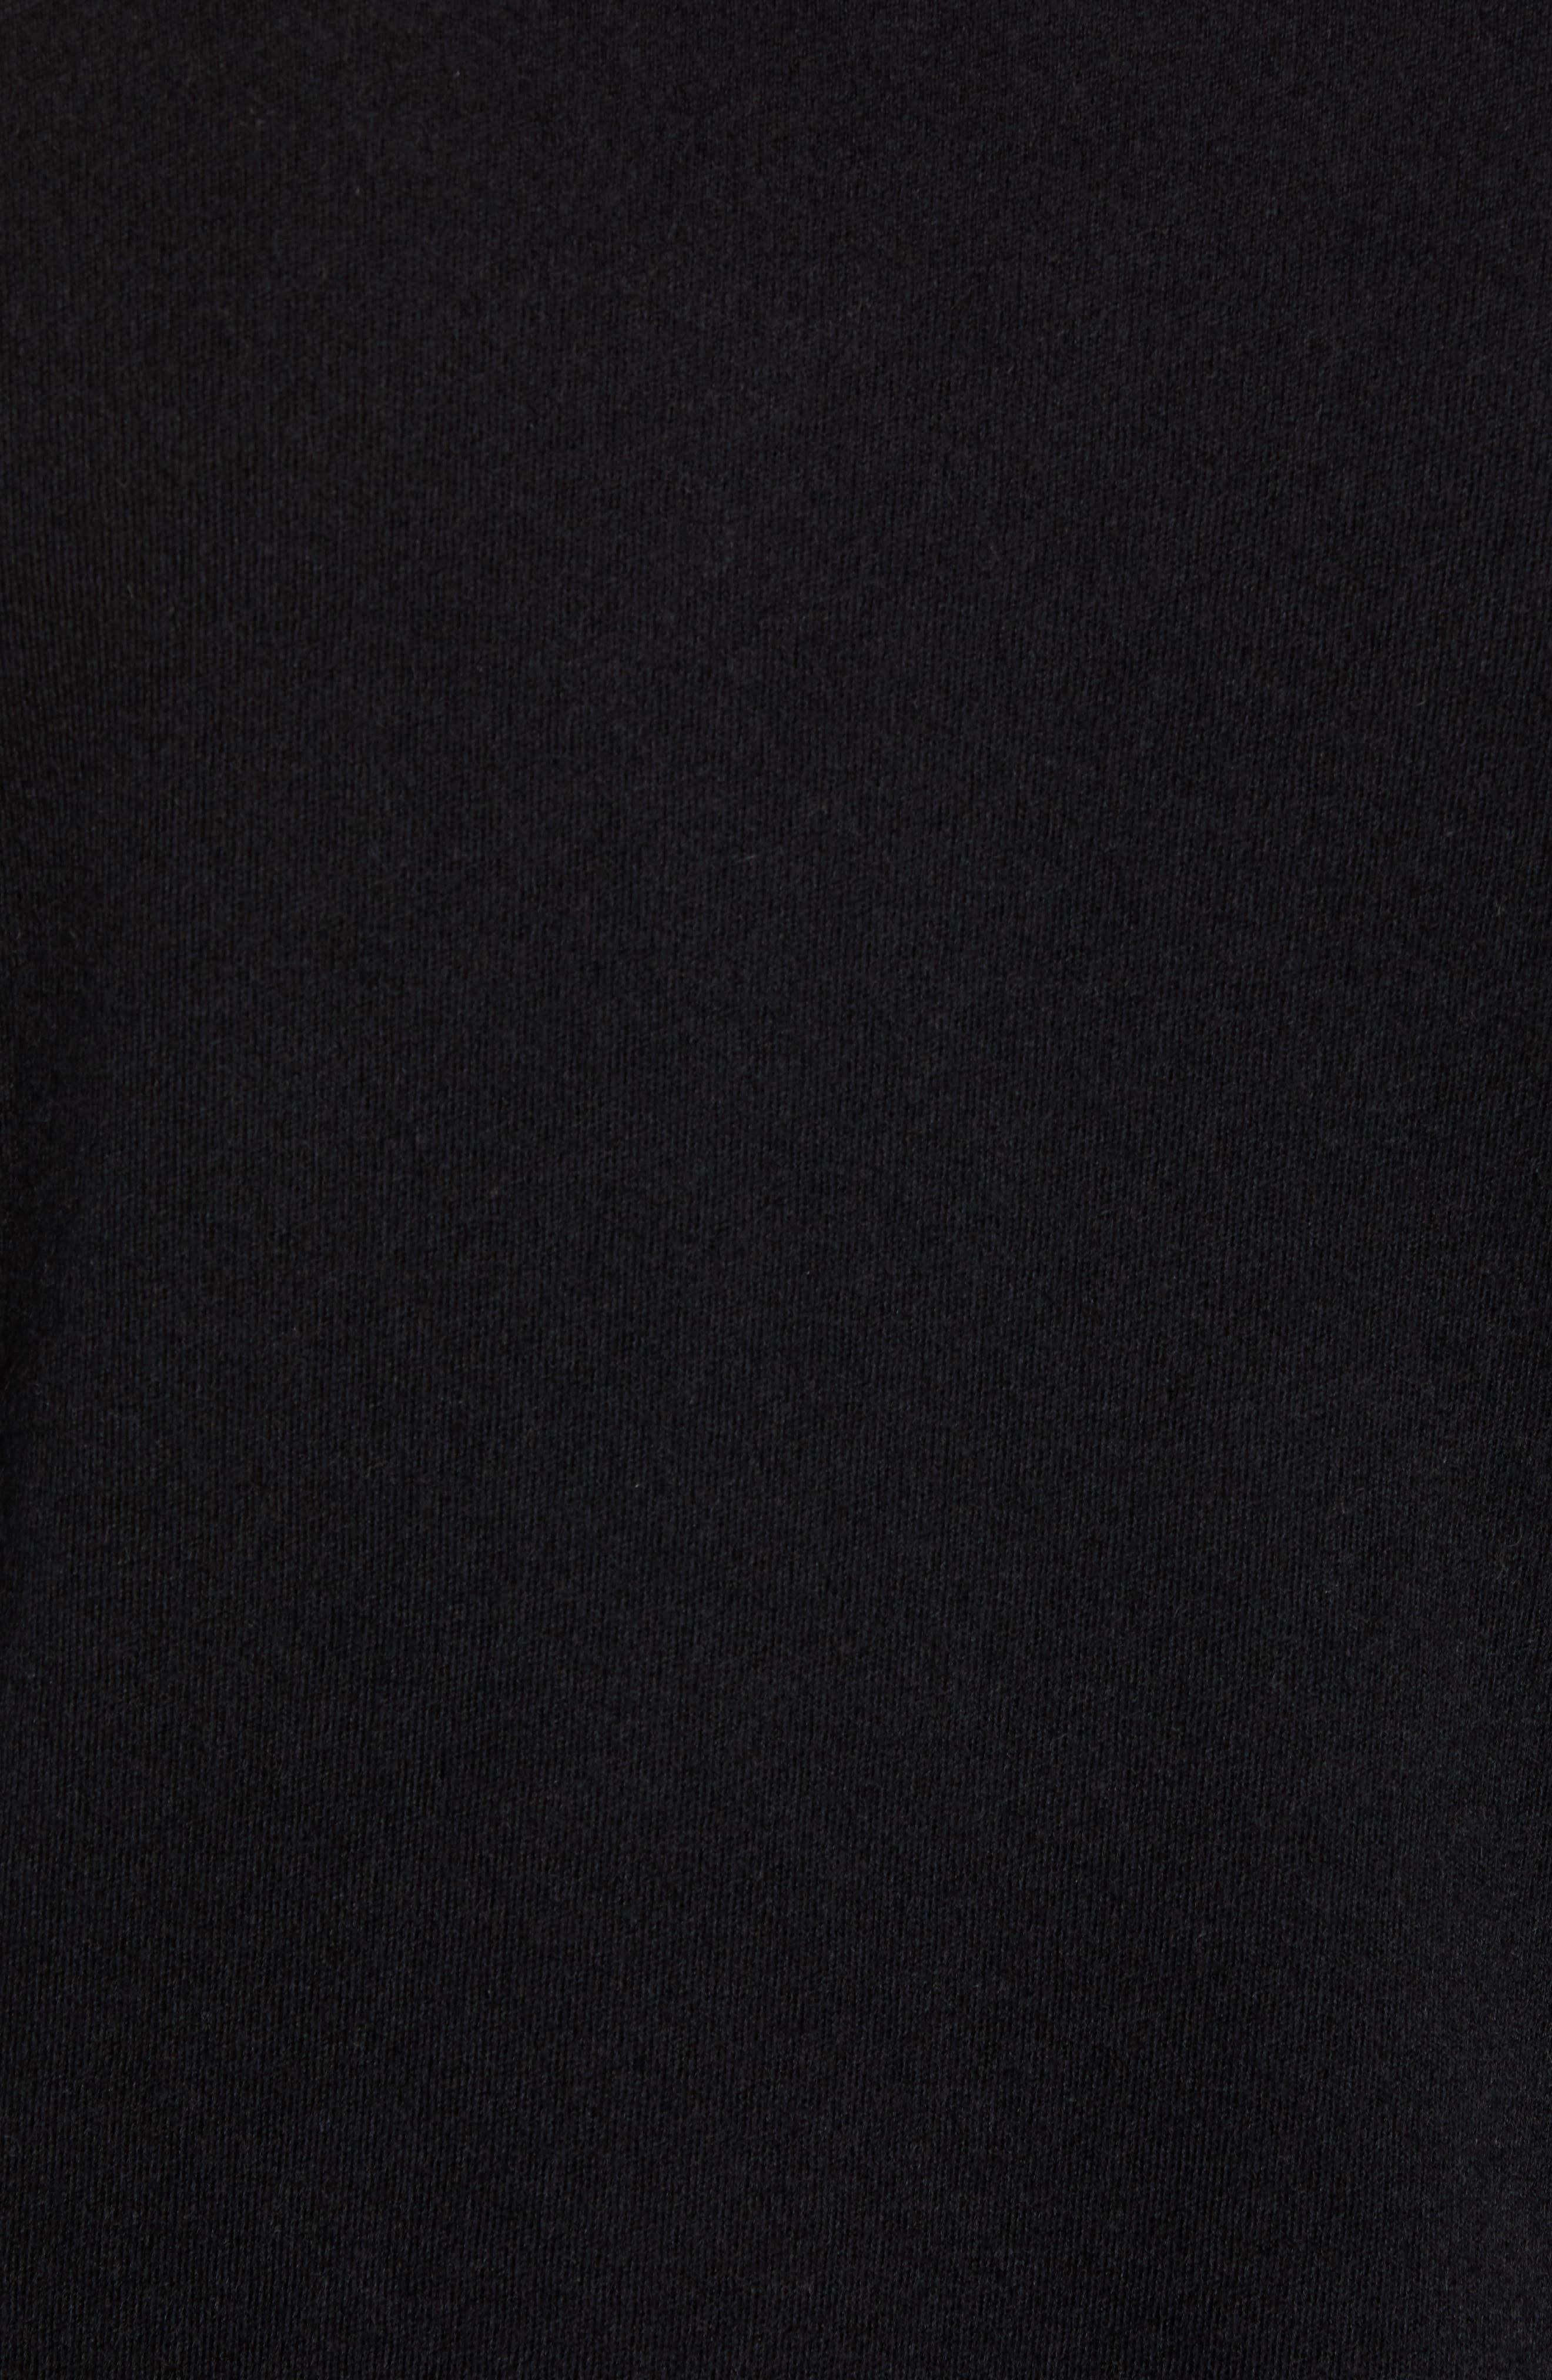 Crewneck Cashmere Sweater,                             Alternate thumbnail 5, color,                             BLACK CAVIAR